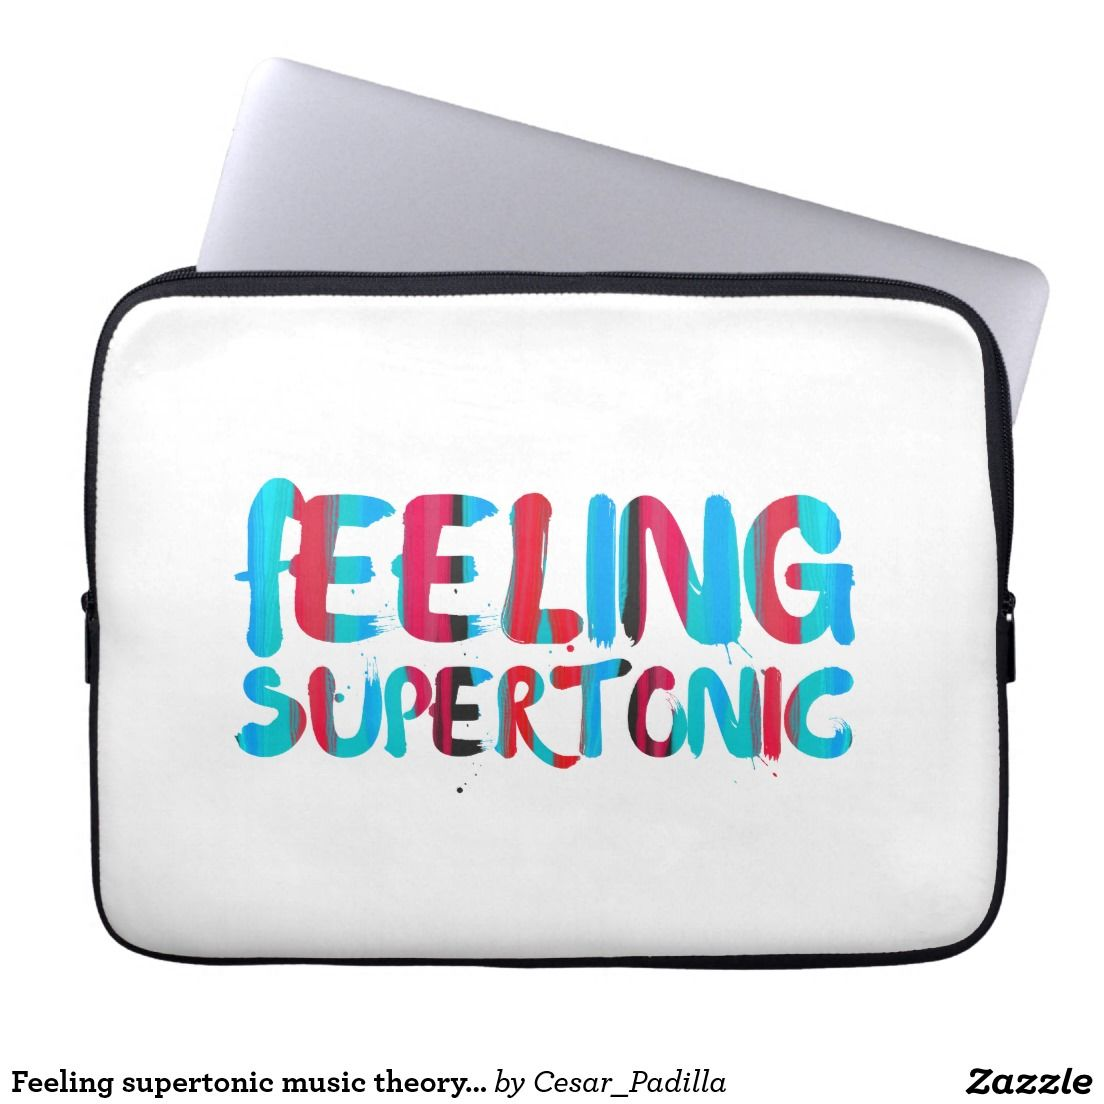 Feeling supertonic music theory geek pun laptop sleeve   Zazzle ...